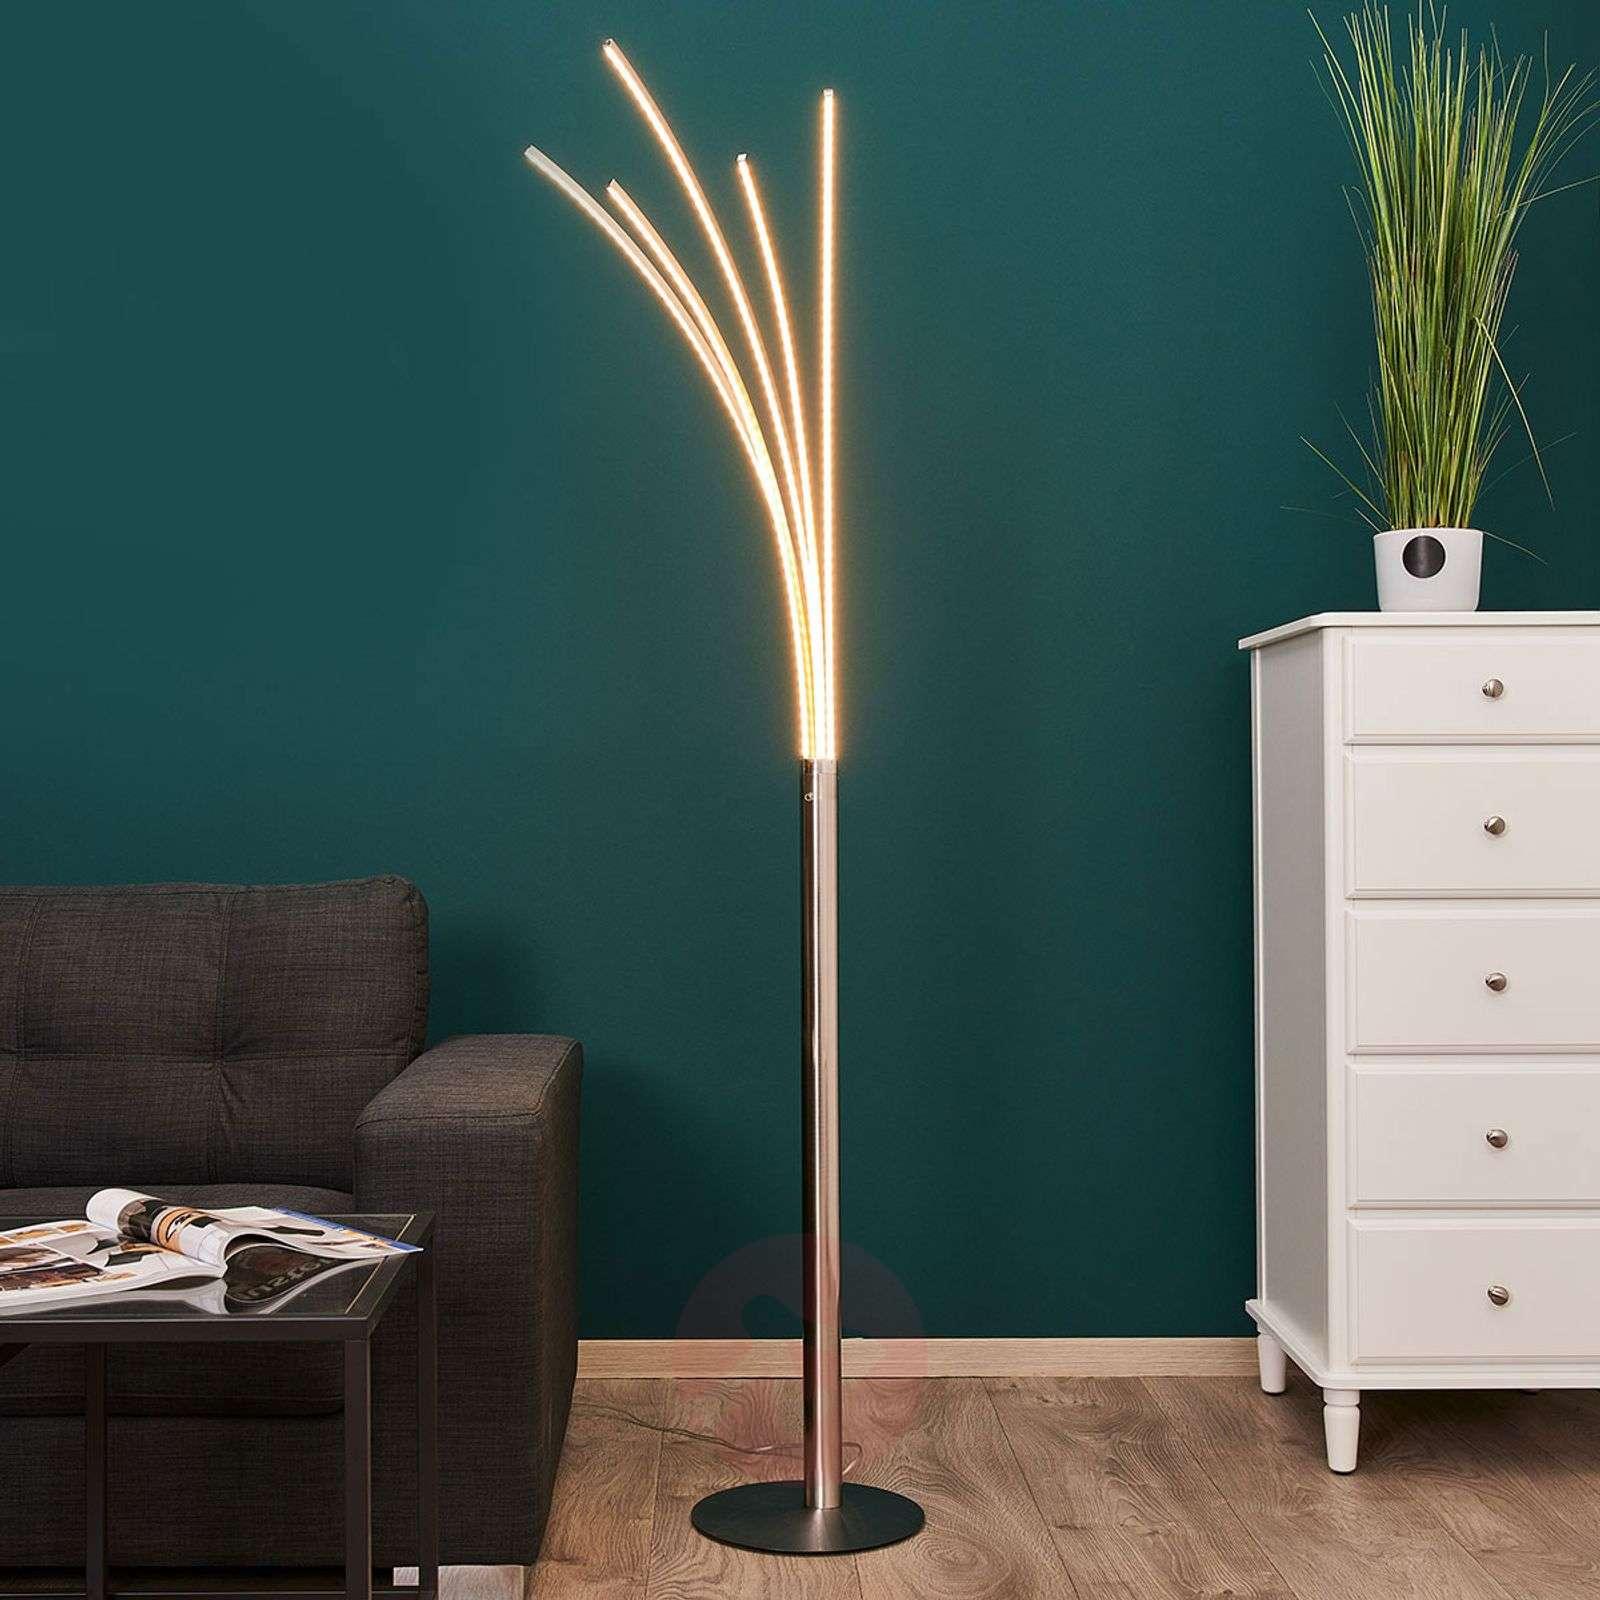 Boba Multi Arm Led Floor Lamp